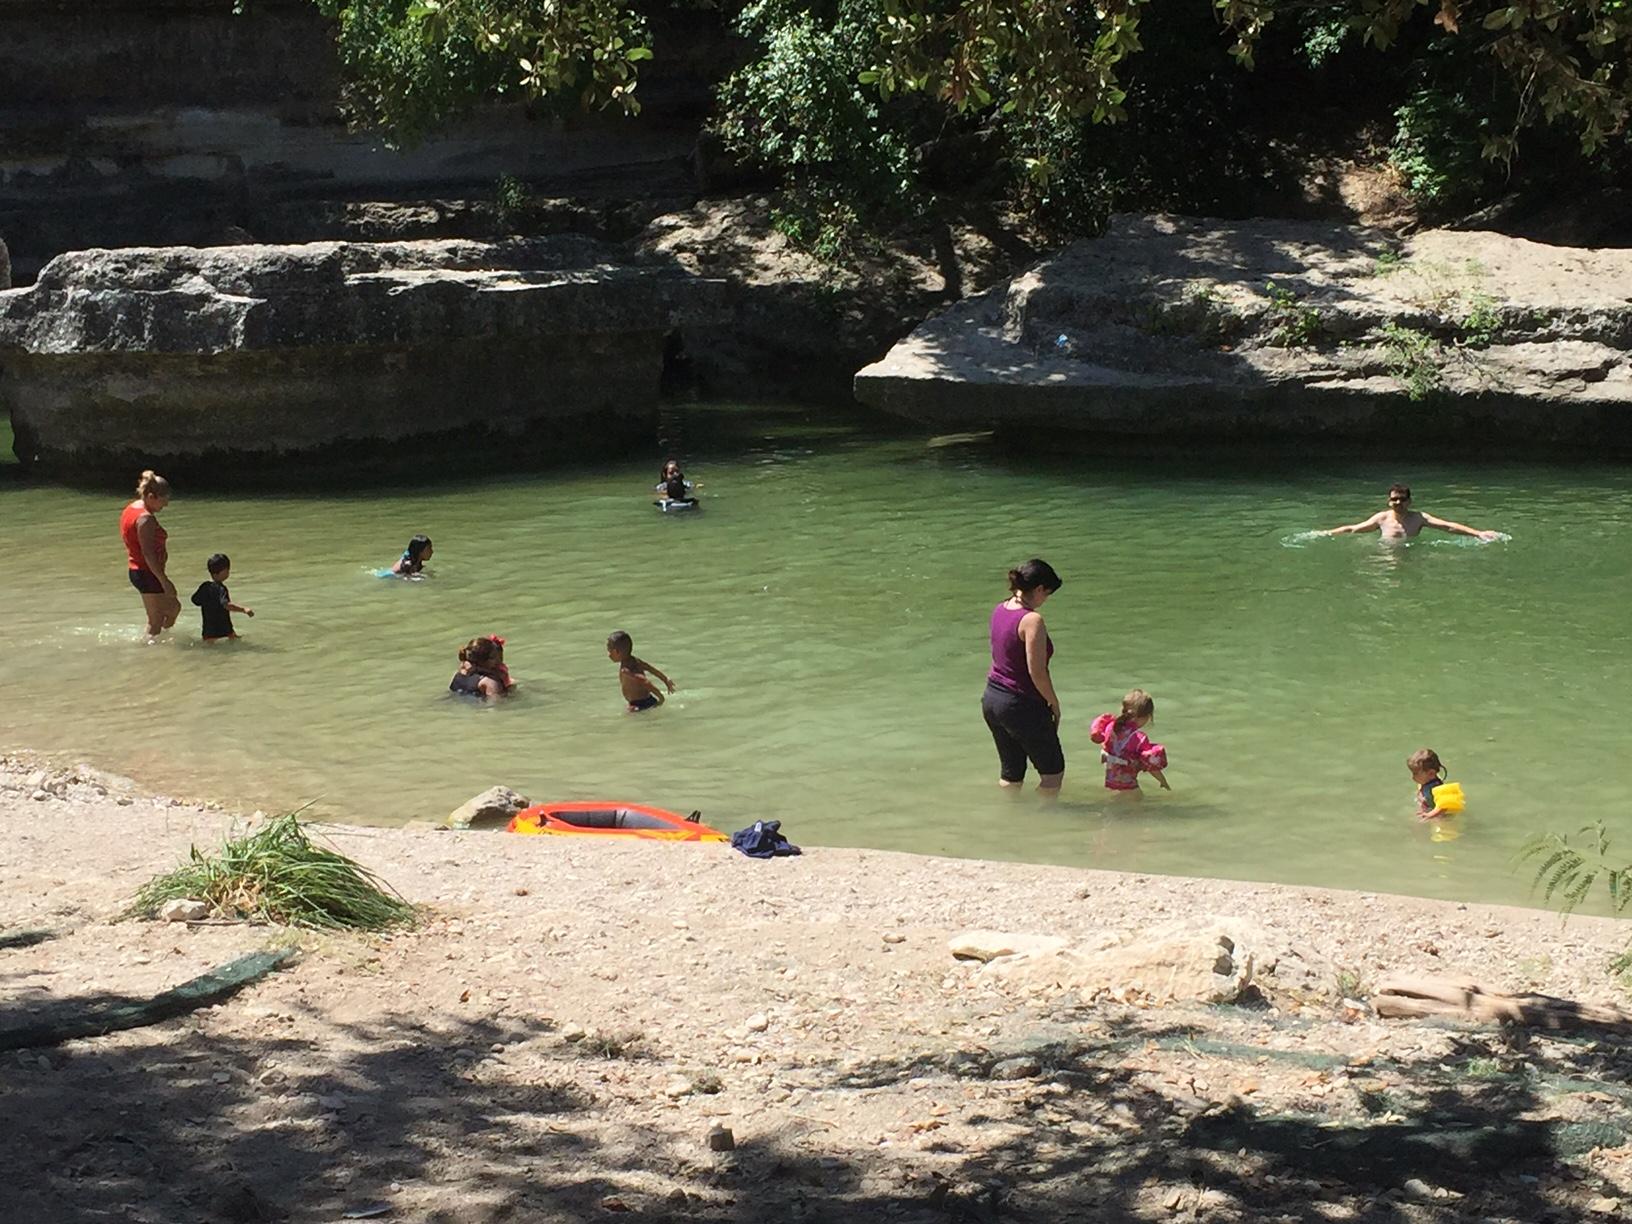 Swimmers in Bull Creek on July 25, 2016_316532